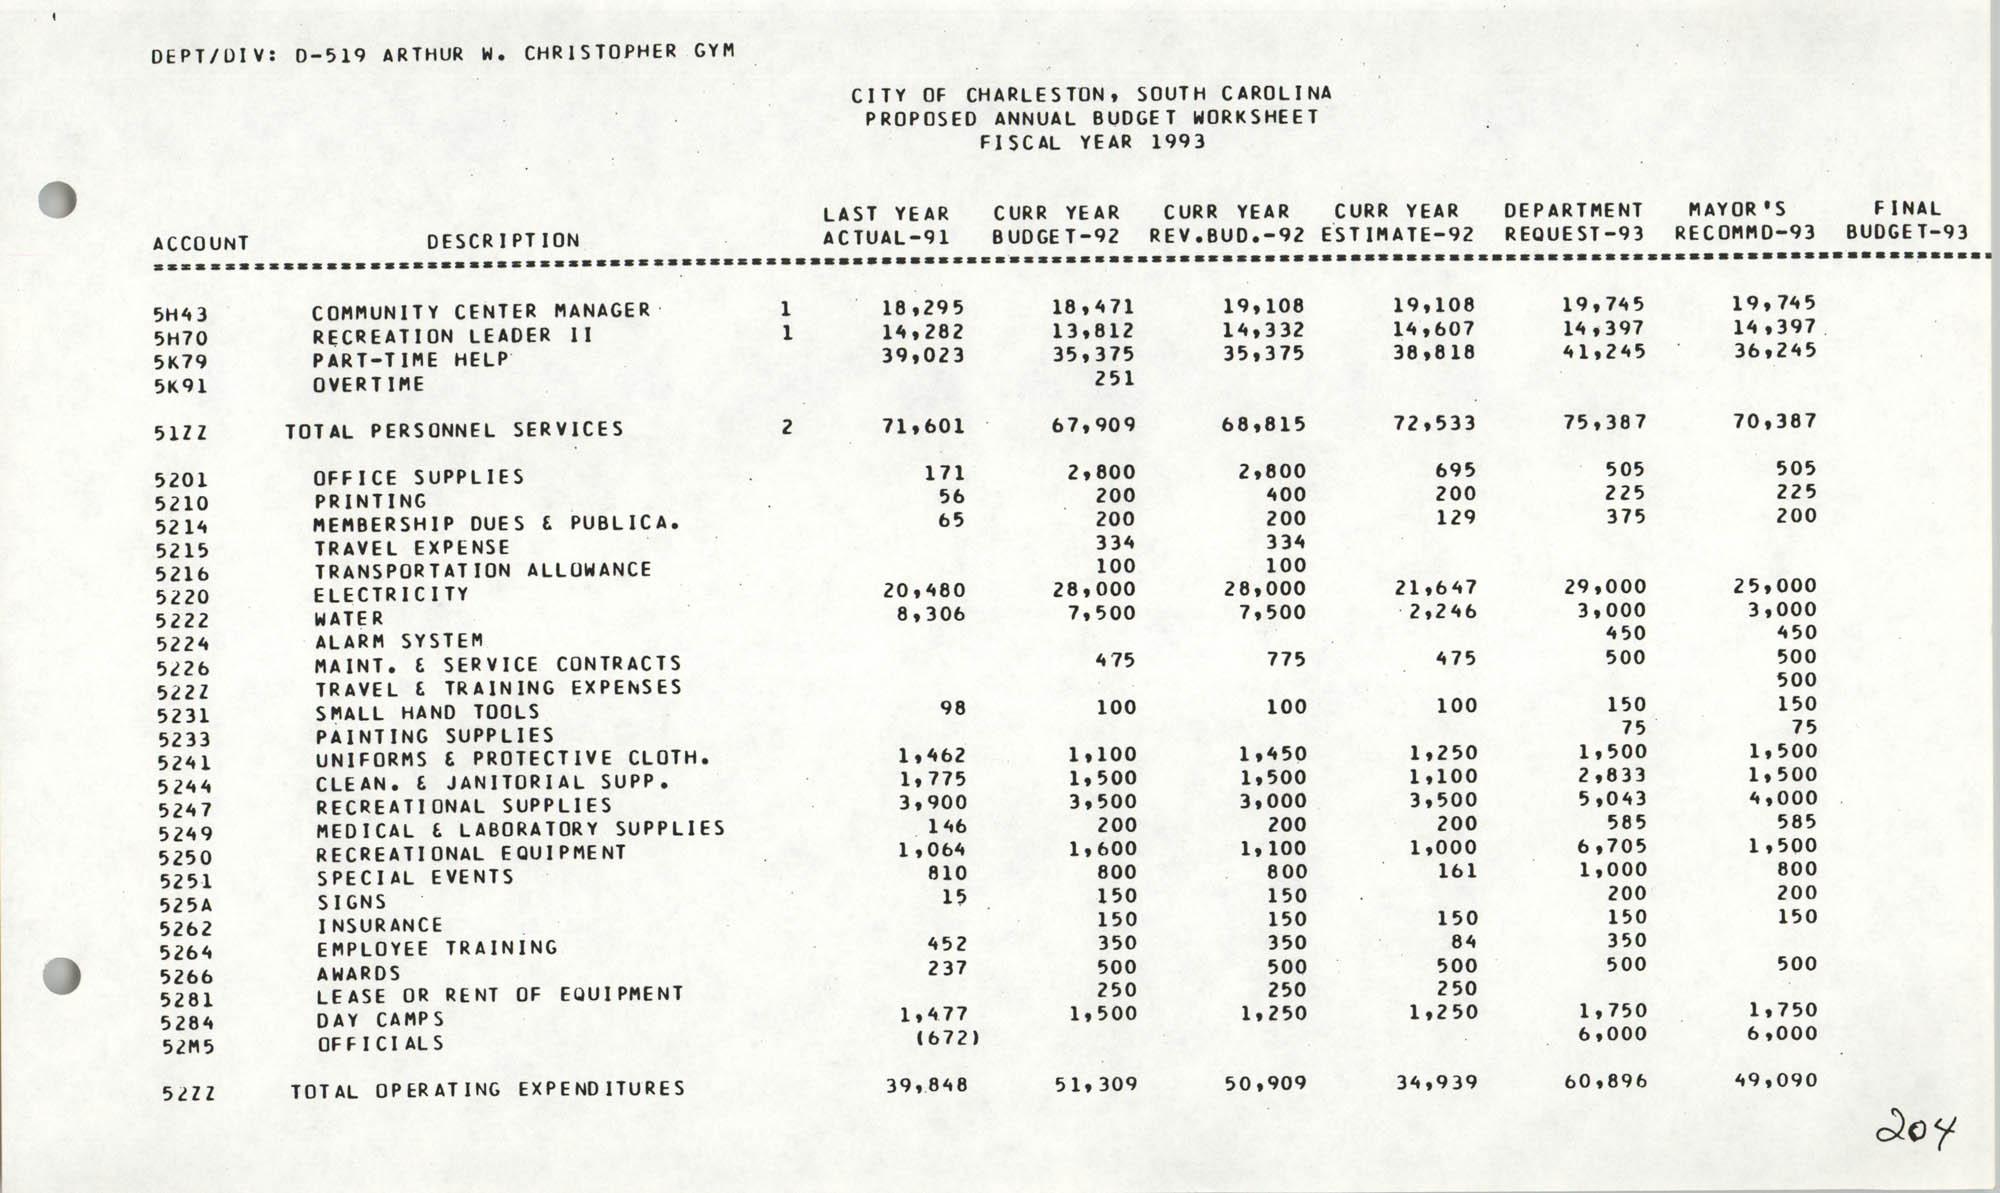 The City Council of Charleston, South Carolina, 1993 Budget, Page 204